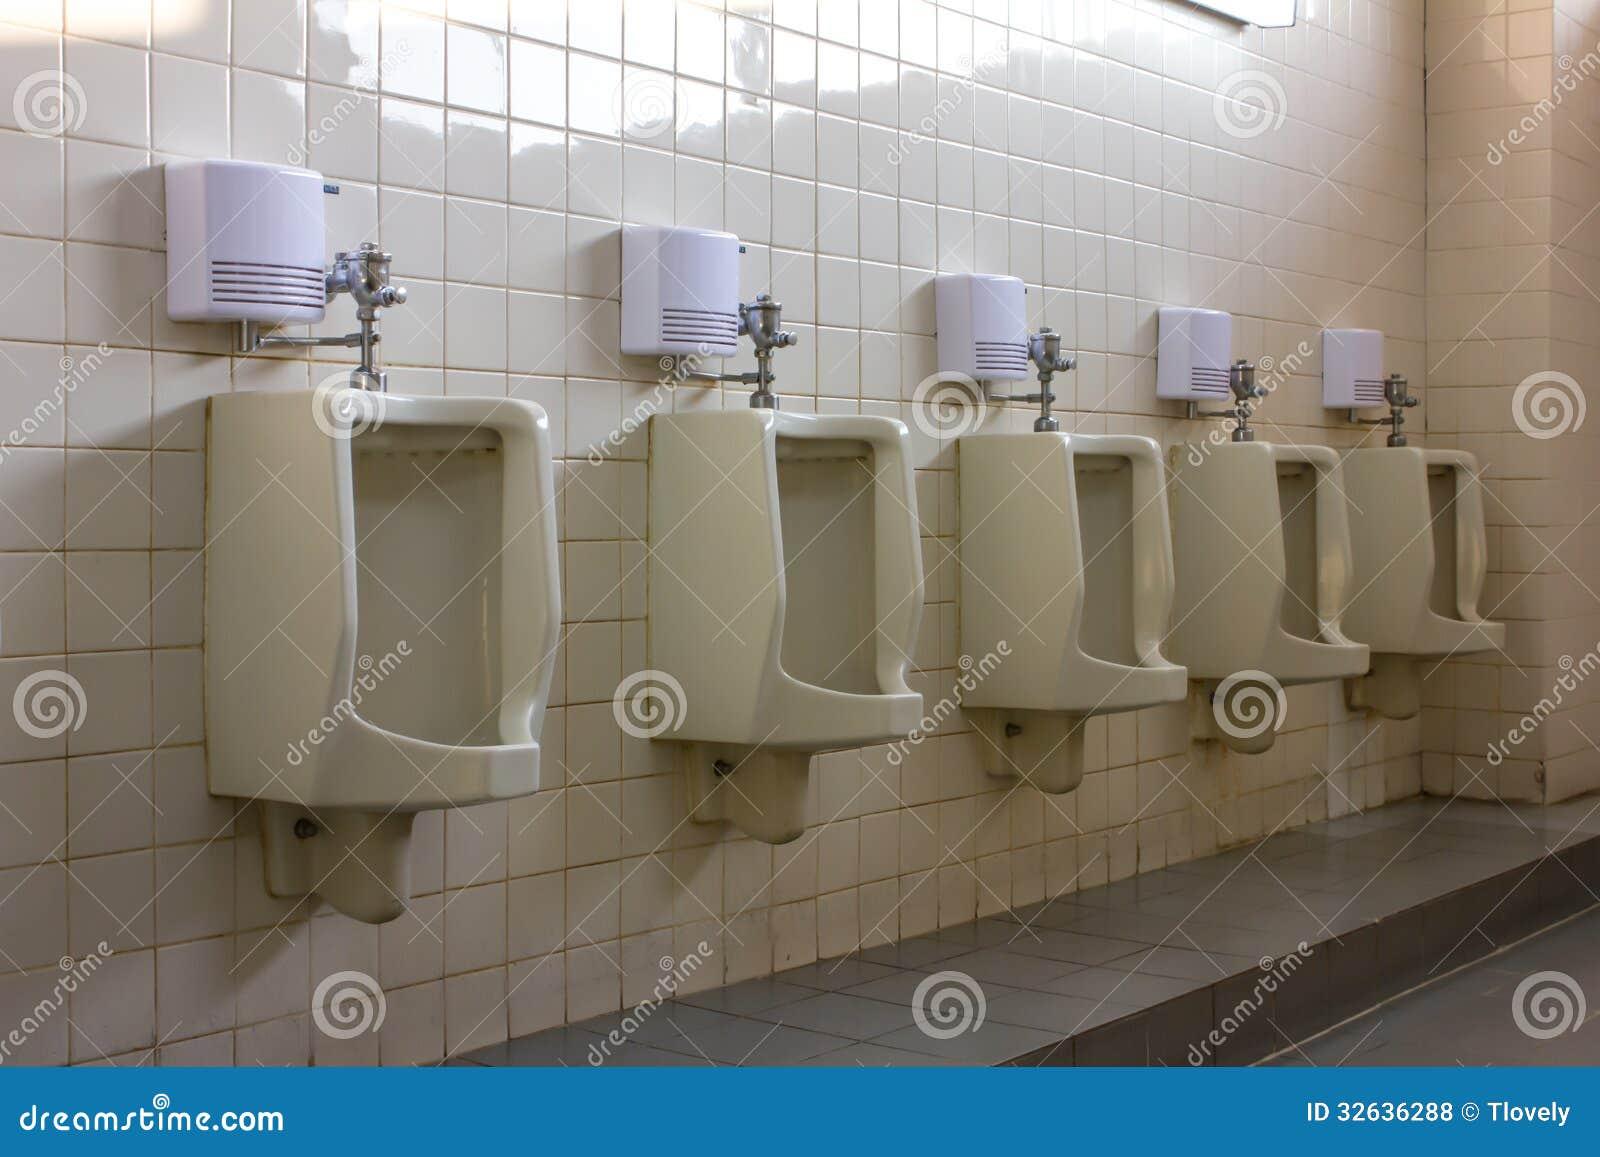 Equipment comfort male in Toilet Urinals. Equipment Comfort Male In Toilet Urinals Royalty Free Stock Photos